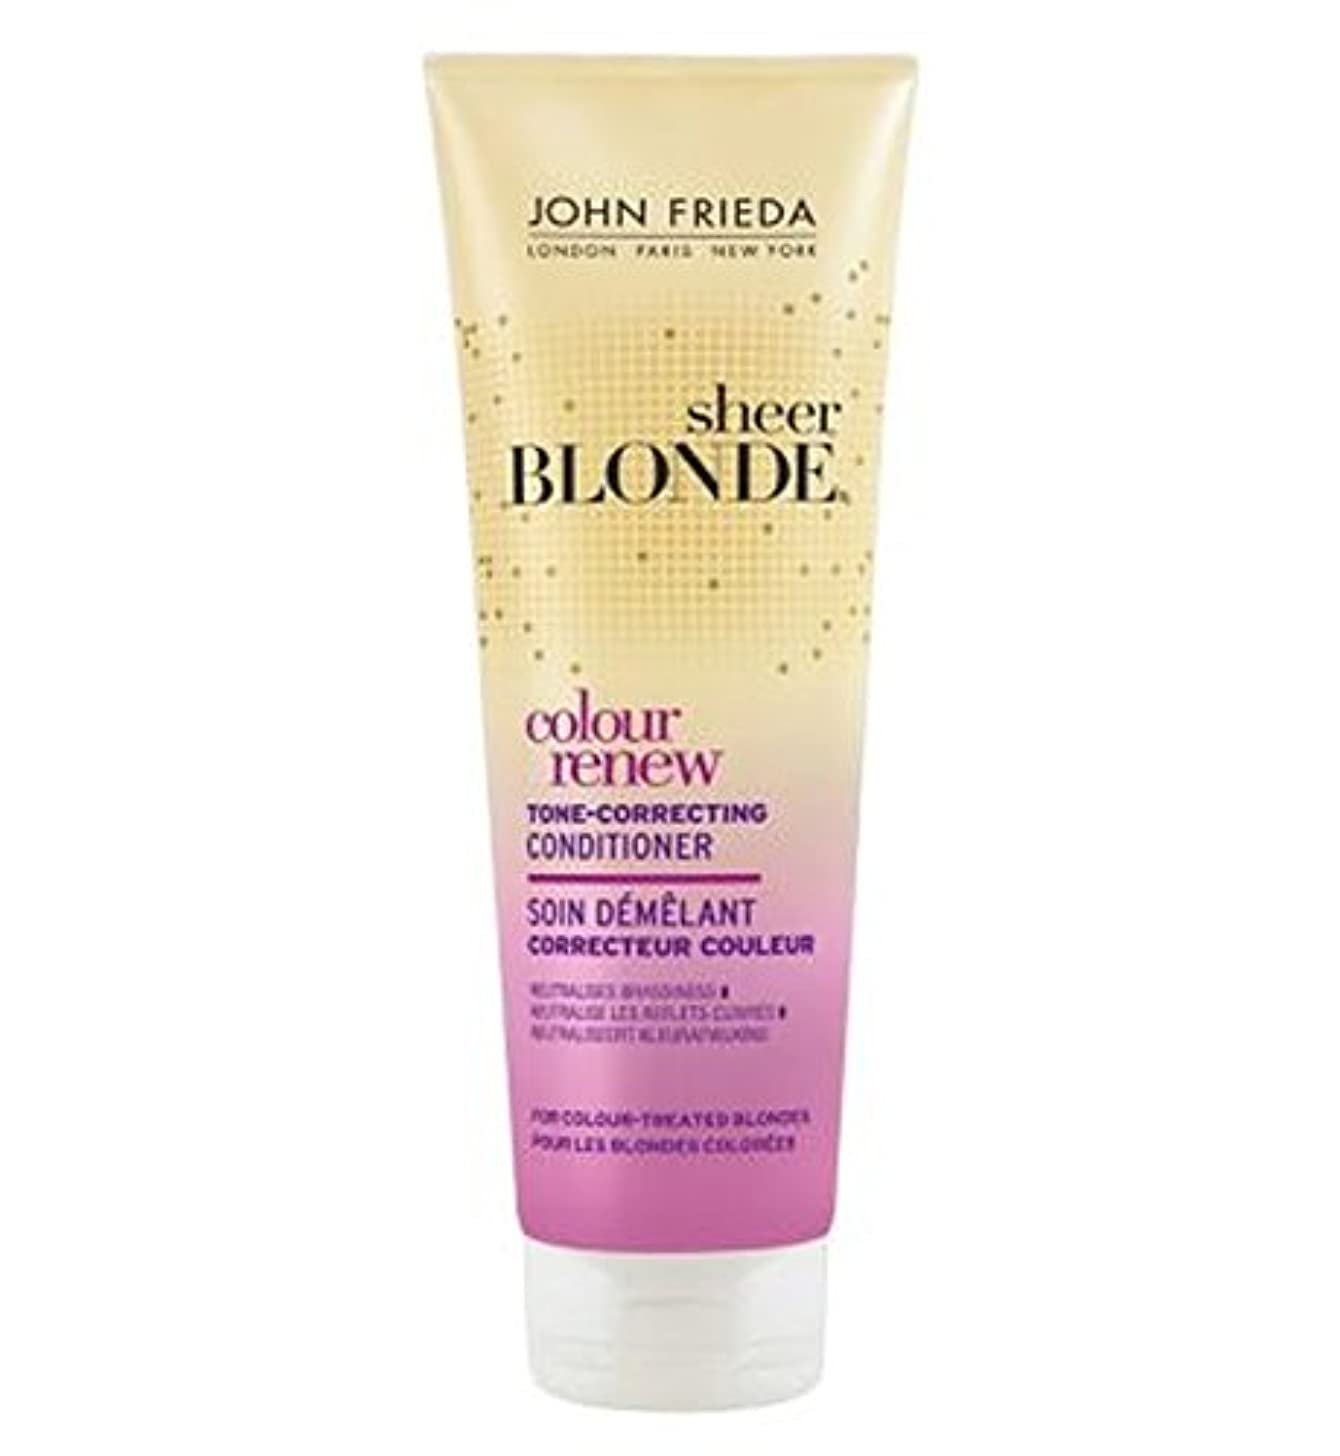 John Frieda Sheer Blonde Colour Renew Tone Correcting Conditioner 250ml - ジョン?フリーダ薄手のブロンド色は色調補正コンディショナー250ミリリットル...